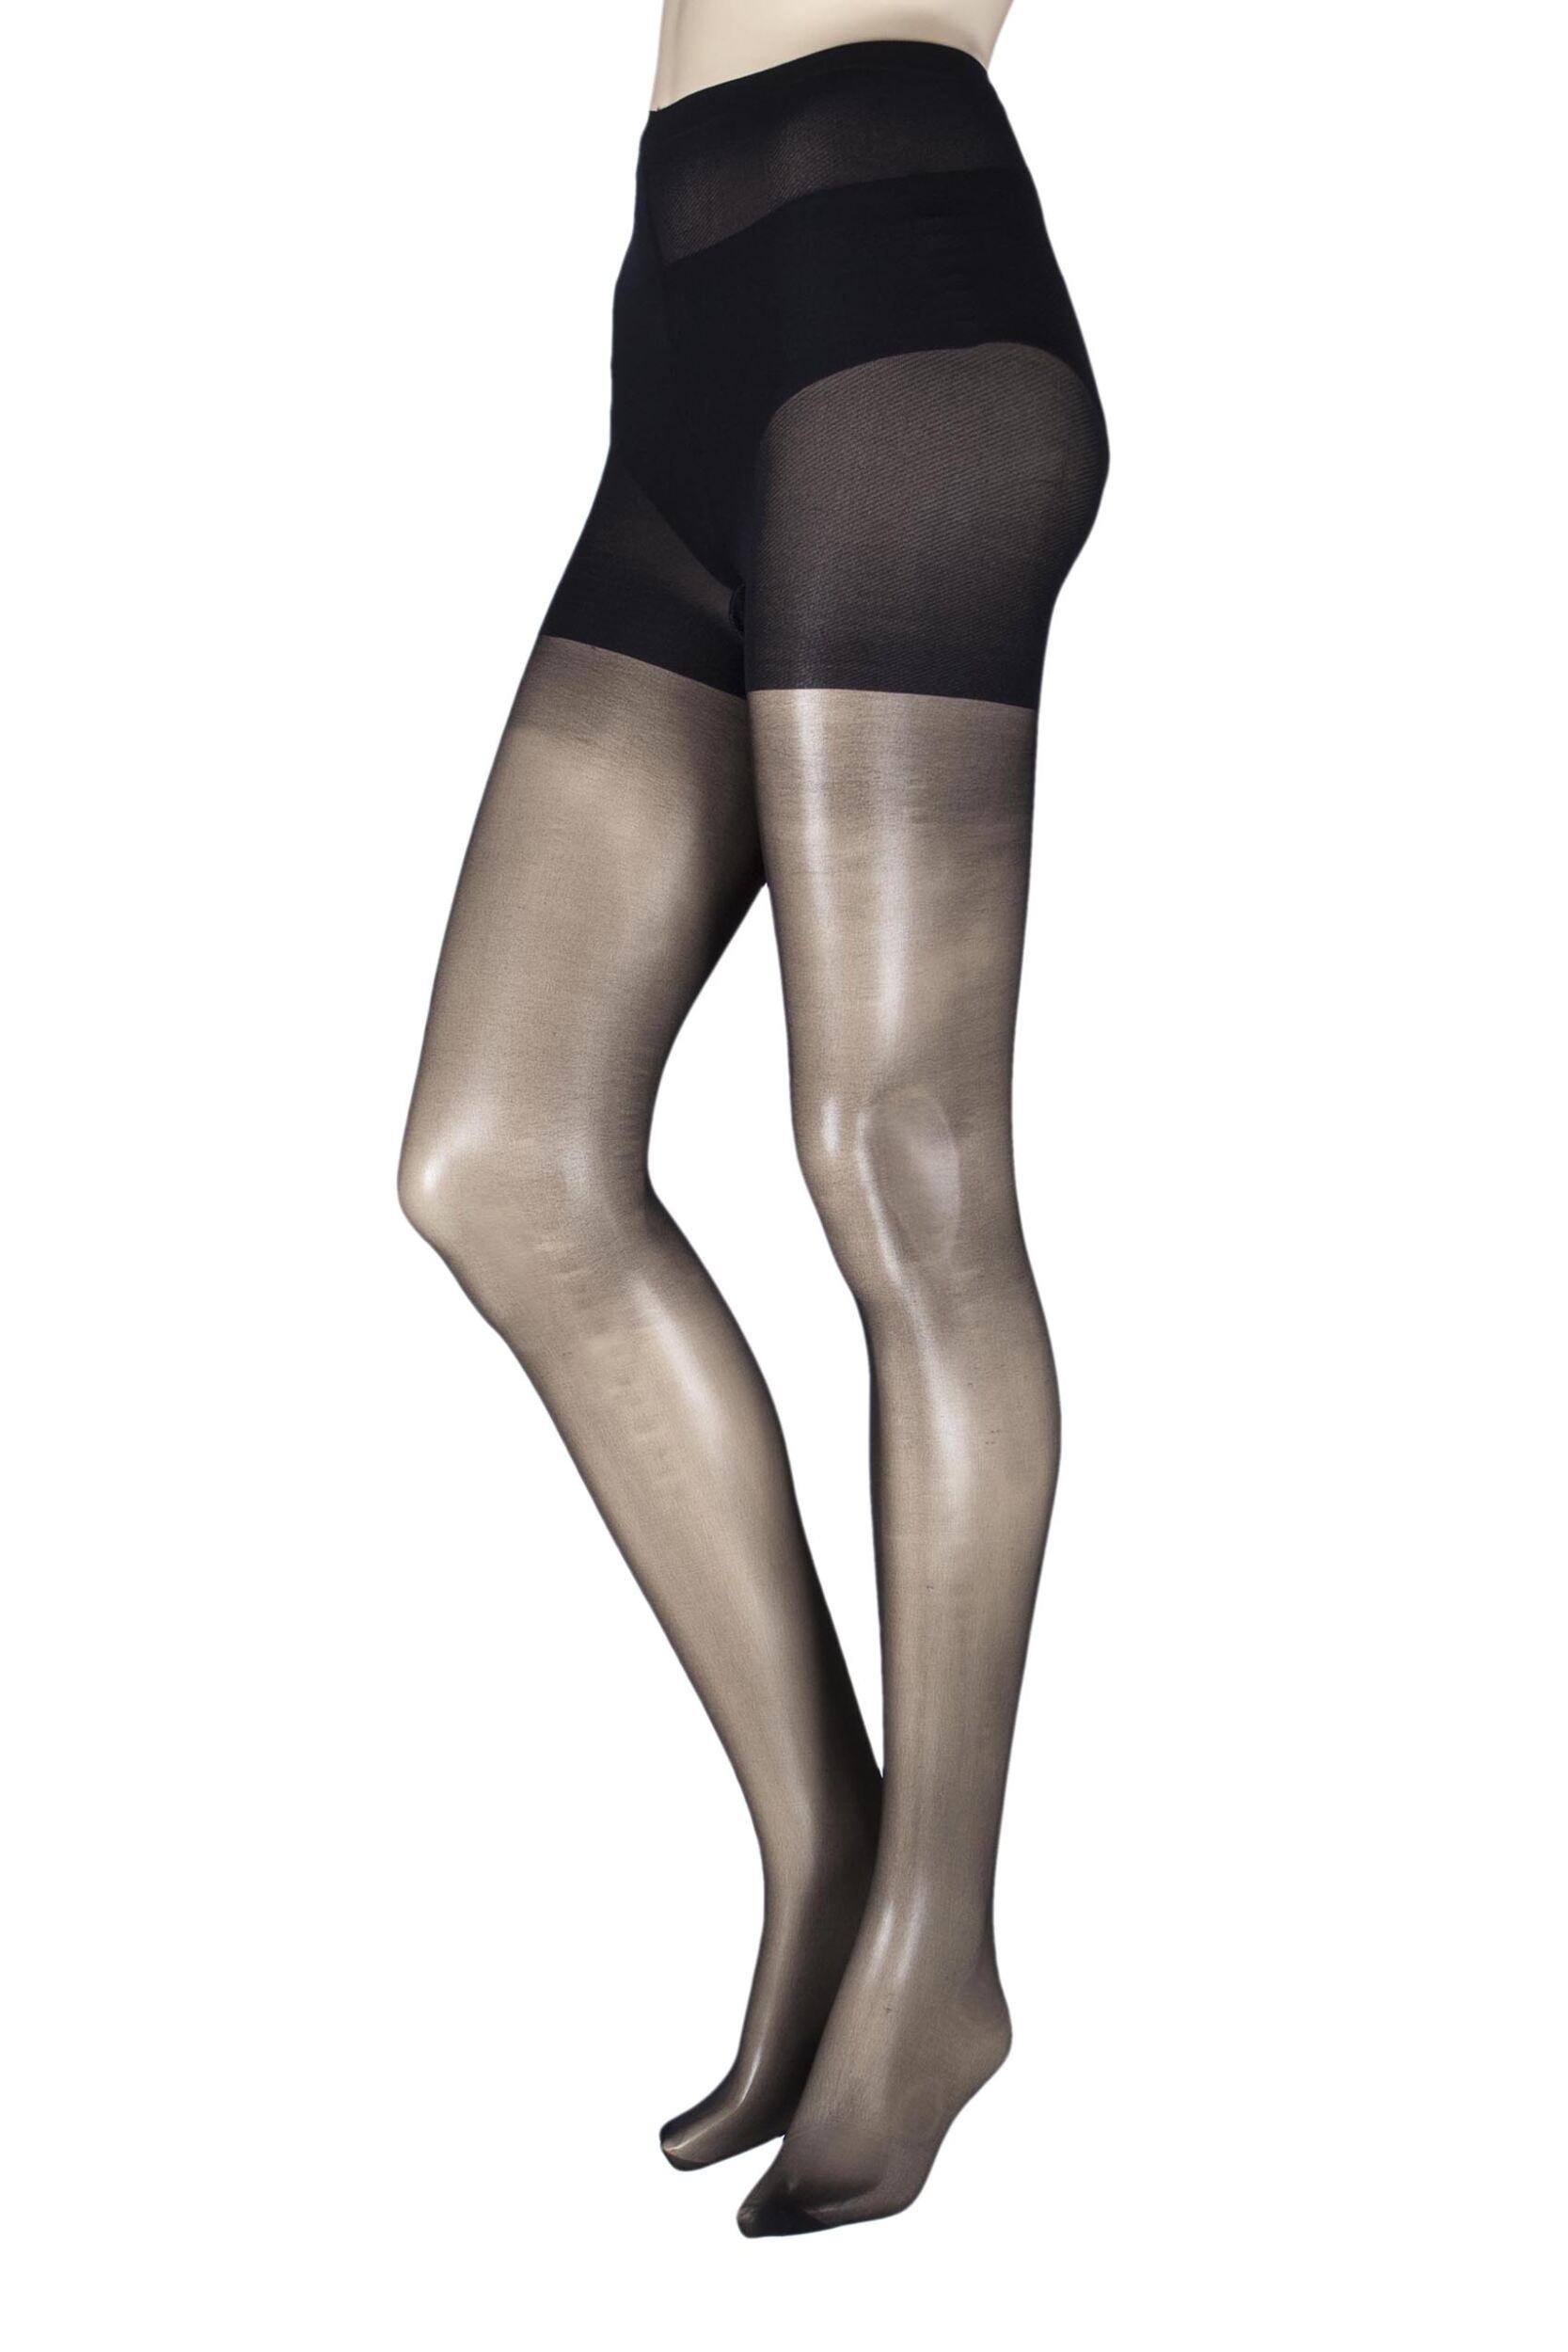 Image of 1 Pair Black 15 Denier Ladder Resist Fusion Tights Ladies Medium/Large - Pretty Legs